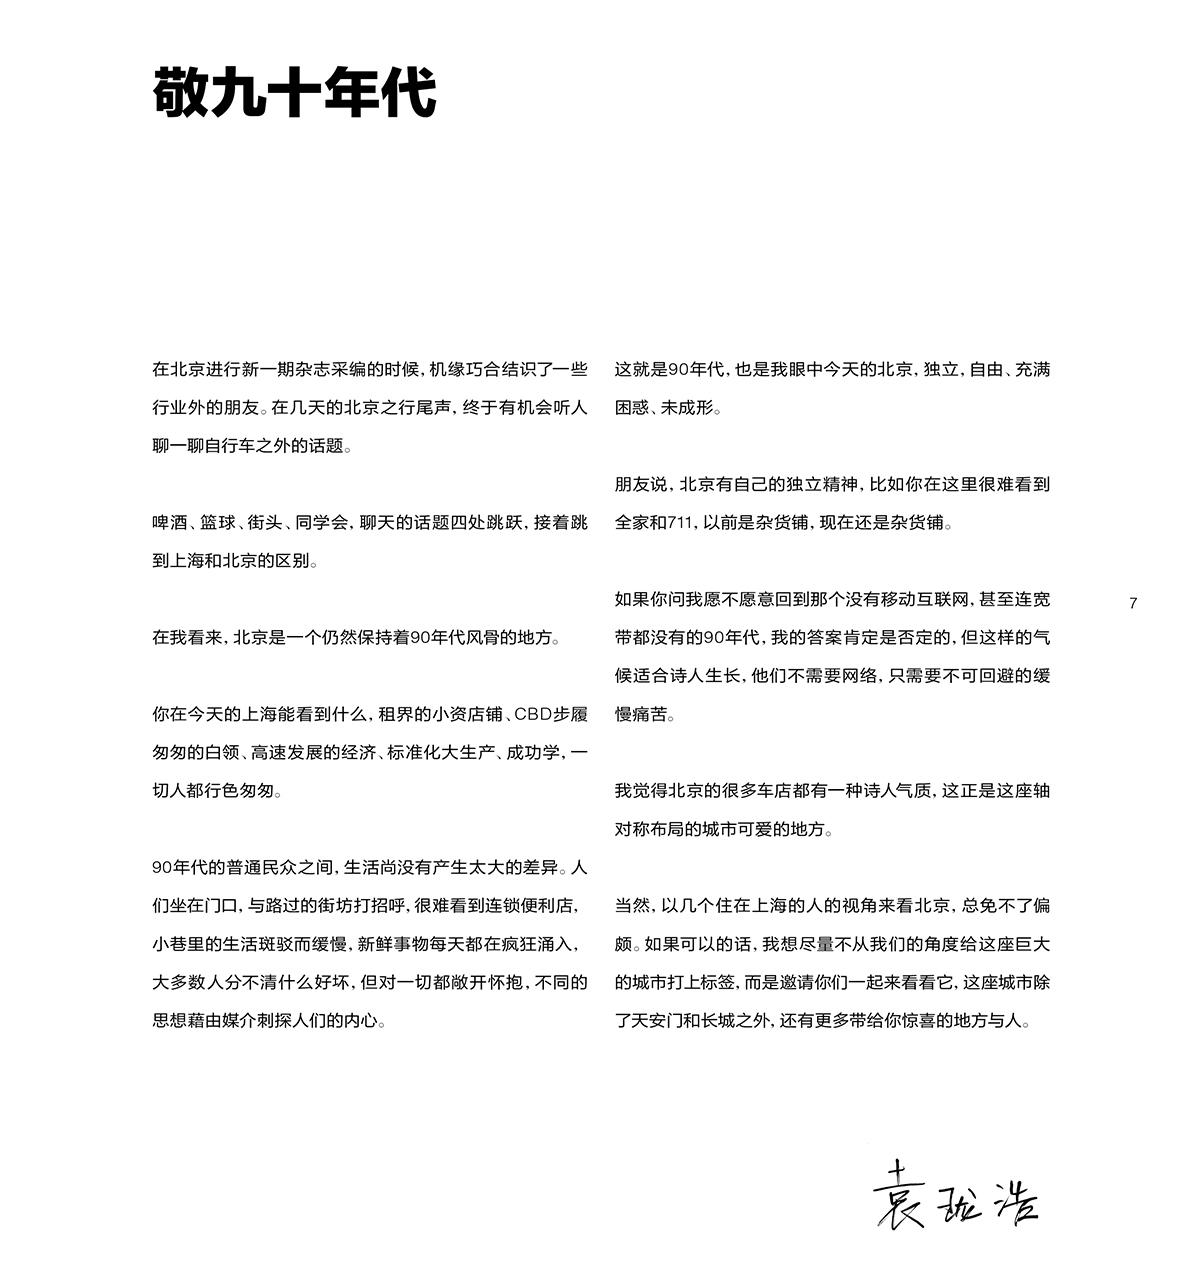 f2-p001-007-8.jpg